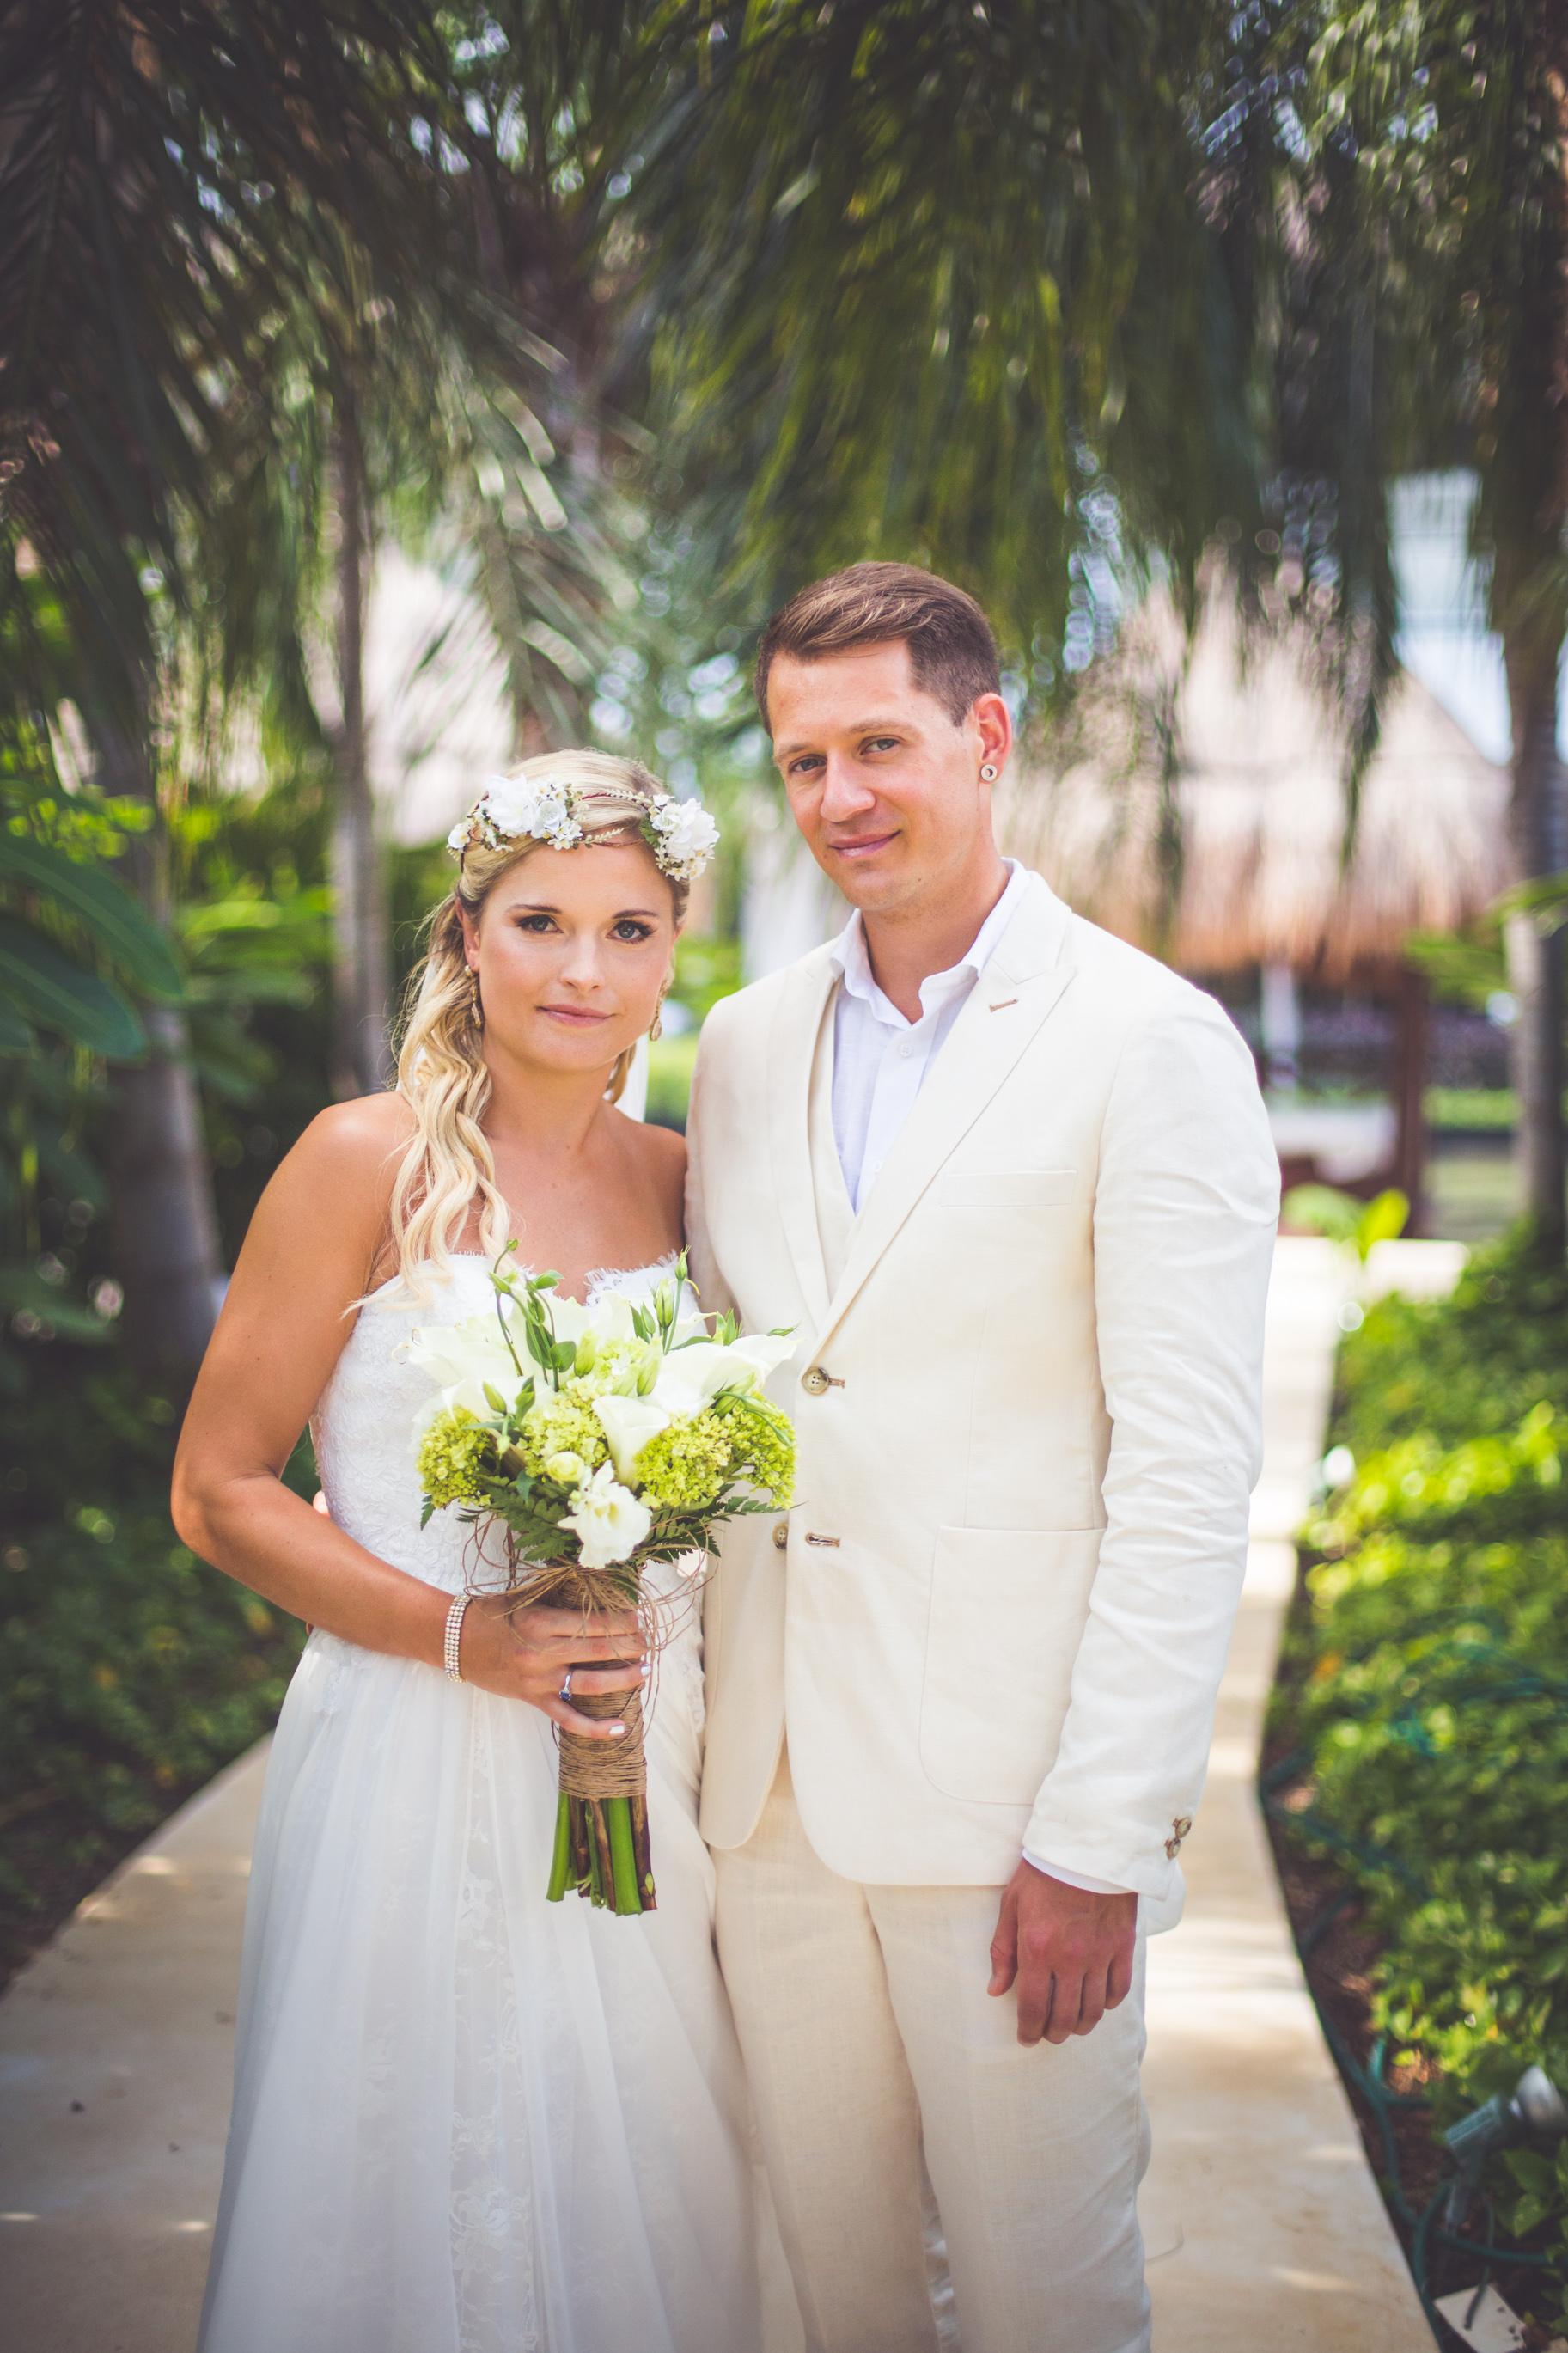 CARMEN-PETER-WEDDING-2016-47.jpg